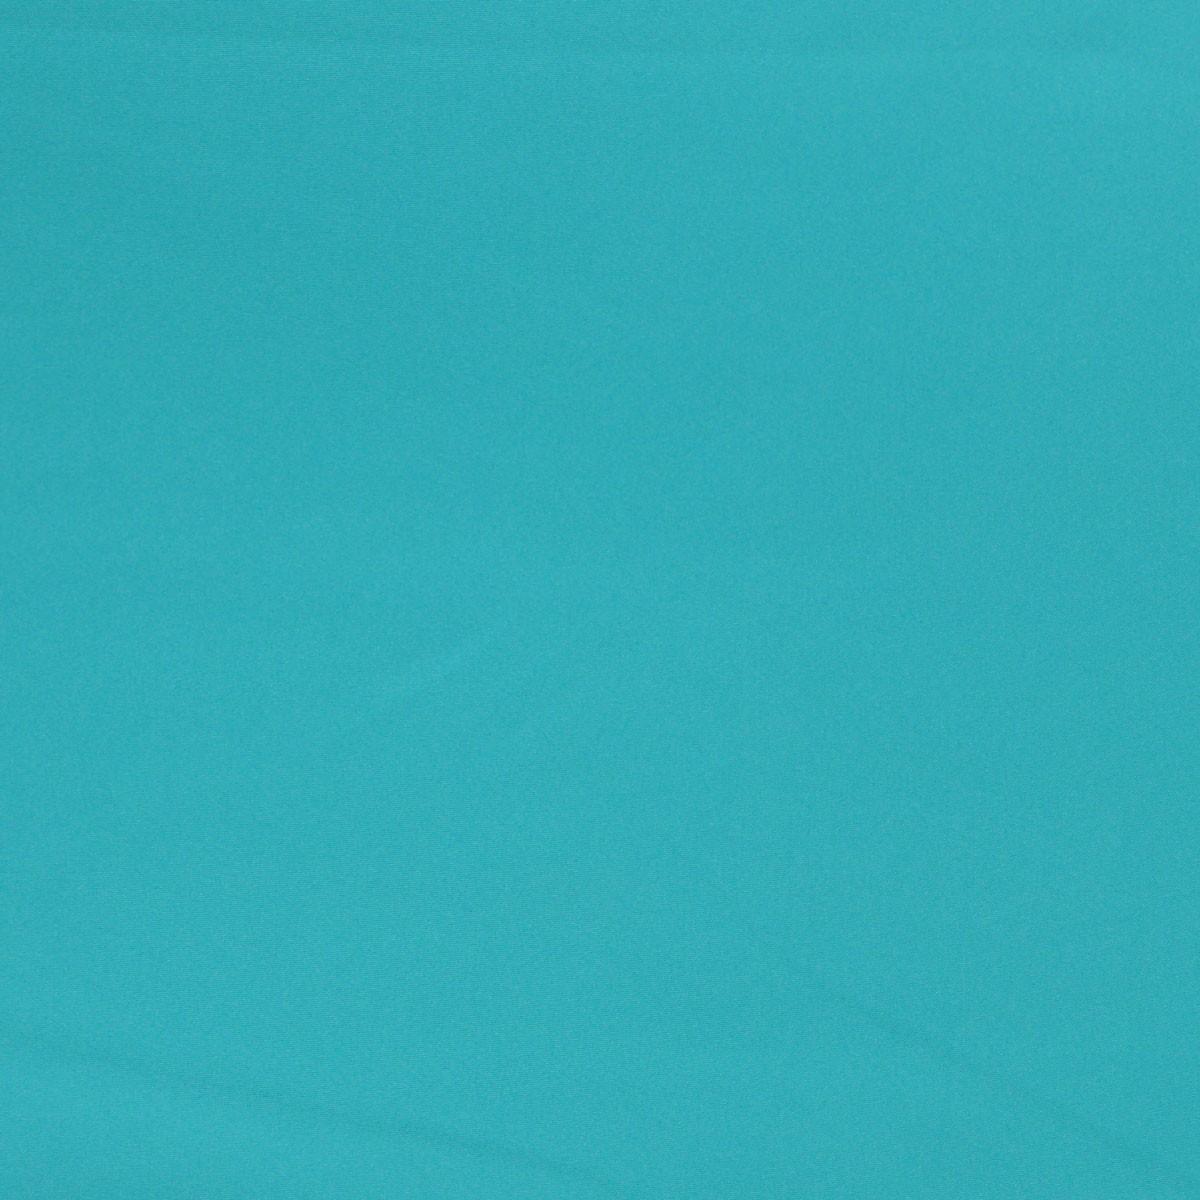 Kreativstoff Universalstoff Polyester Stretch türkis